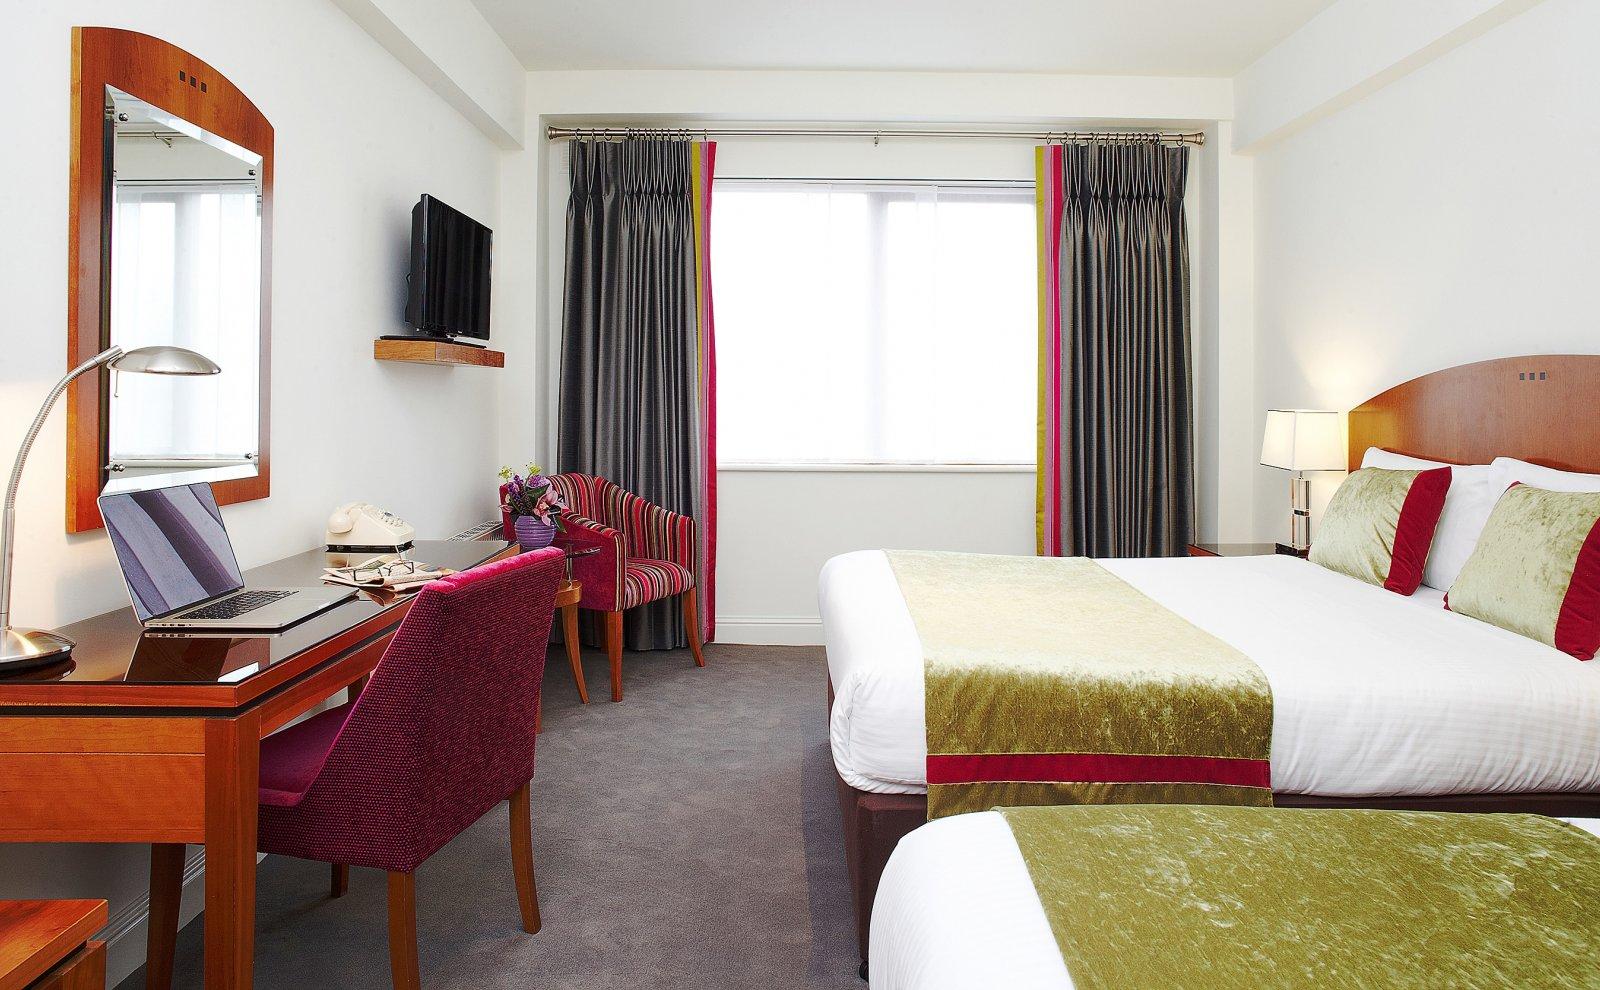 lancaster lodge cork city - official website - cork city accommodation